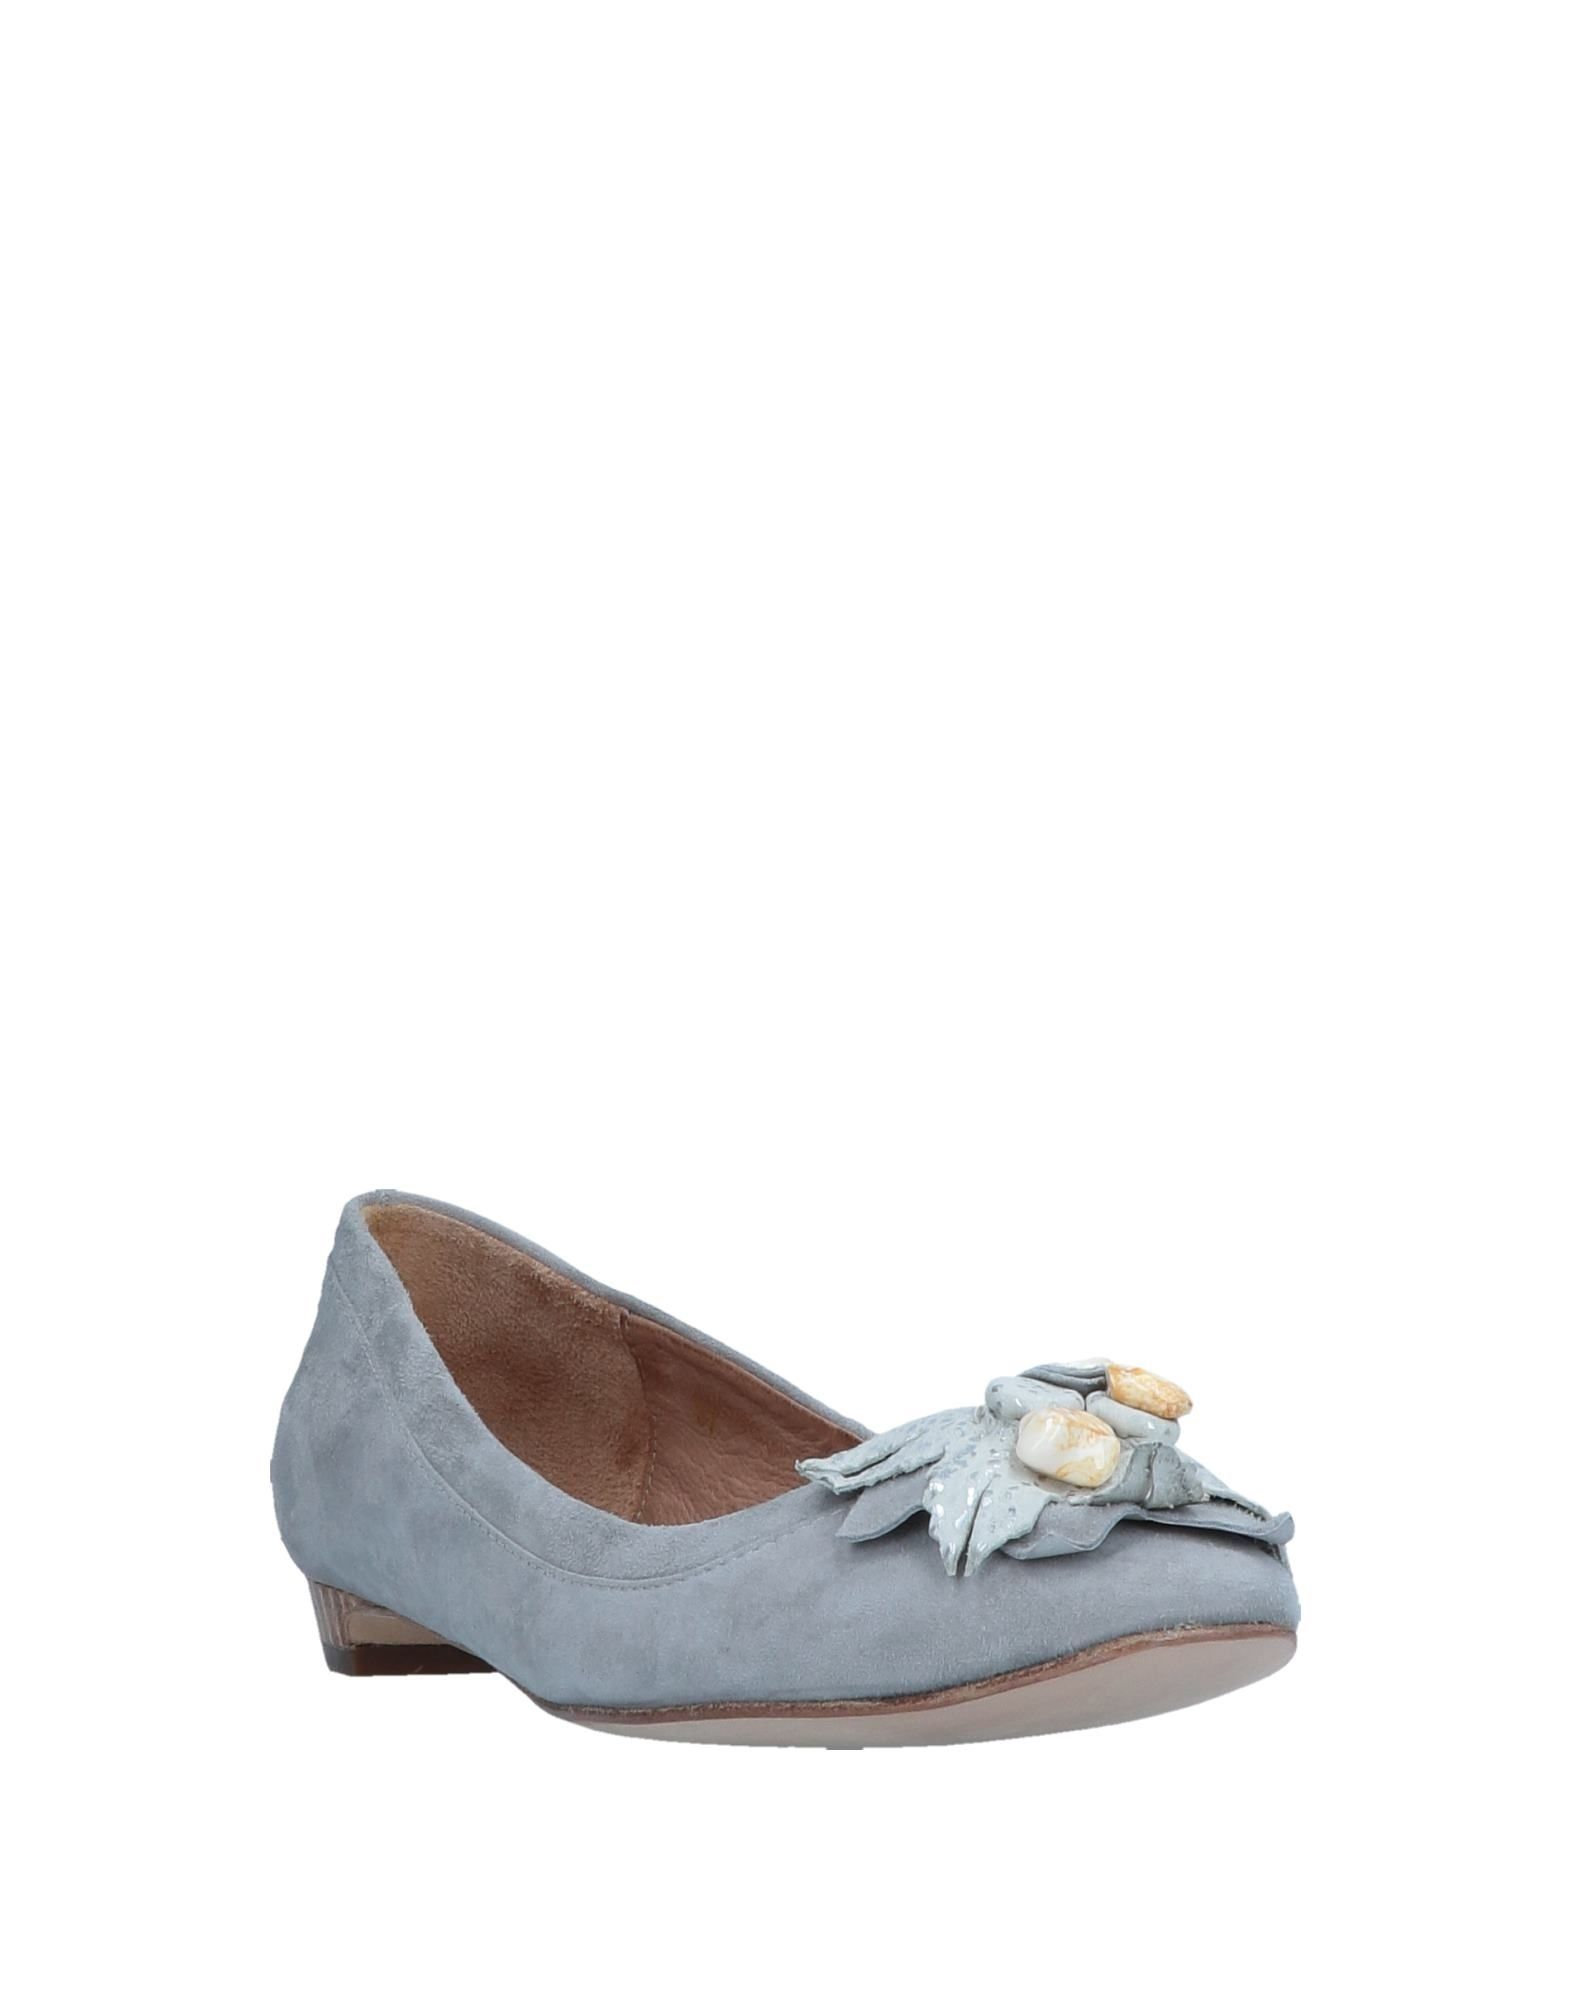 Luciano Barachini Ballerinas Damen  11548588SD Gute Qualität beliebte Schuhe